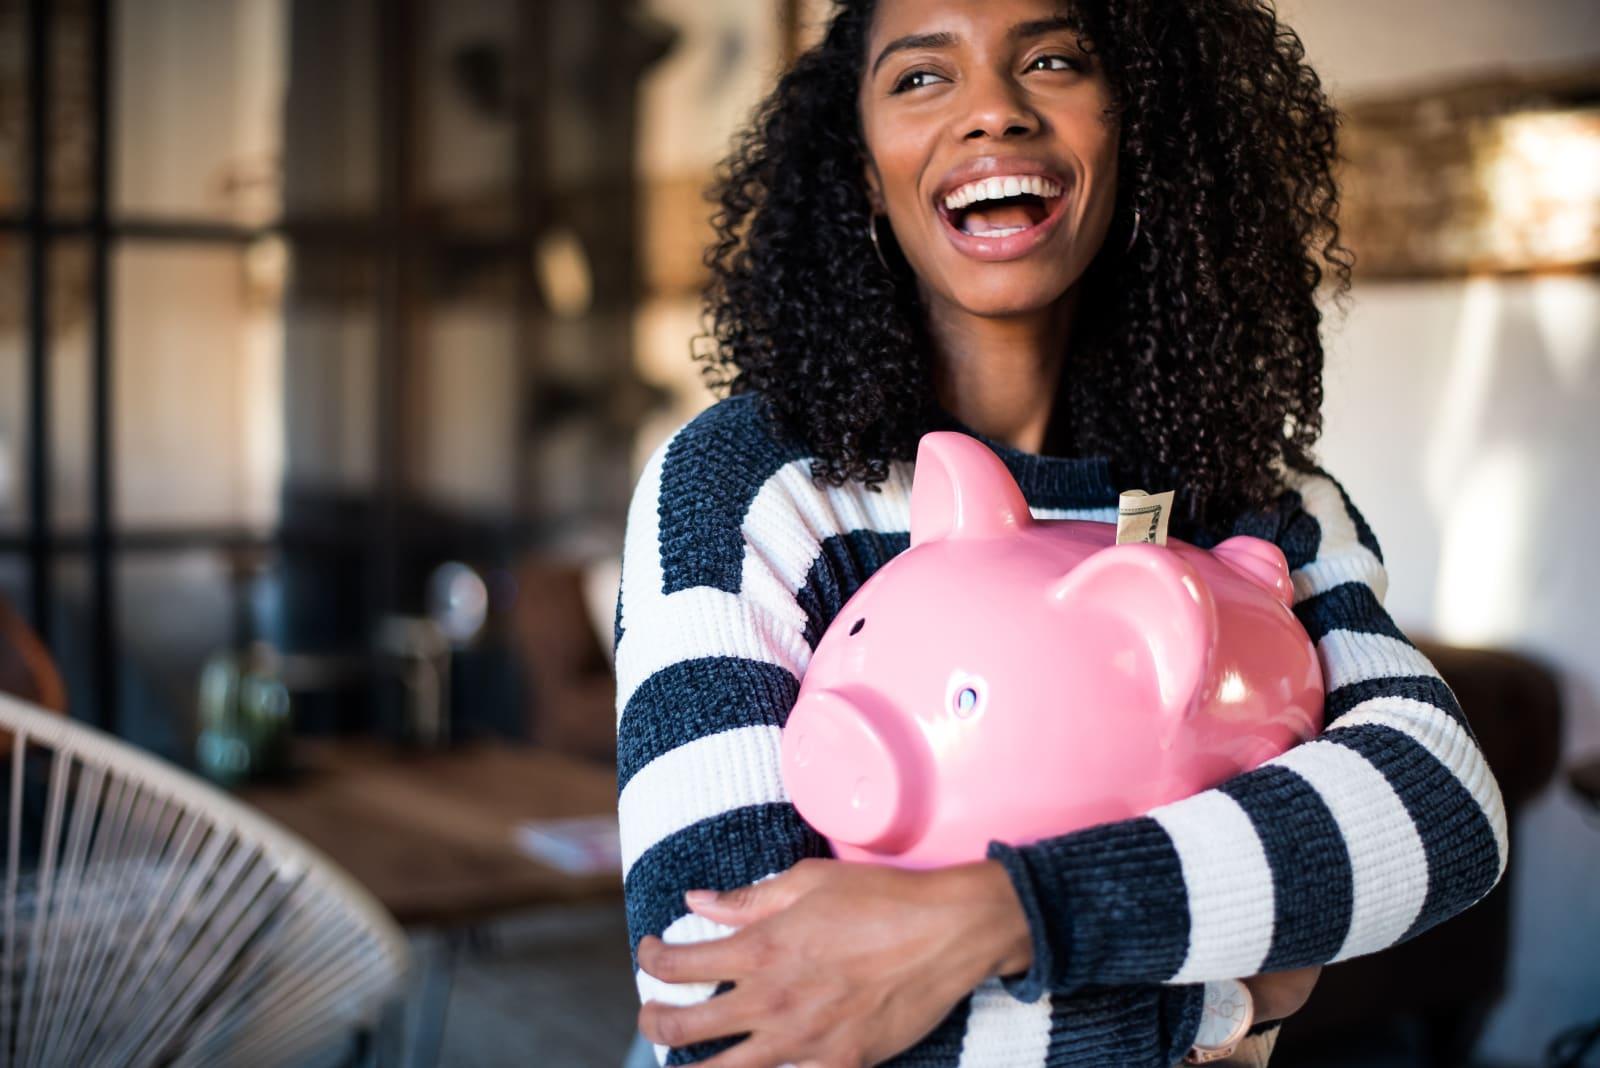 Black woman hugging her piggy bank